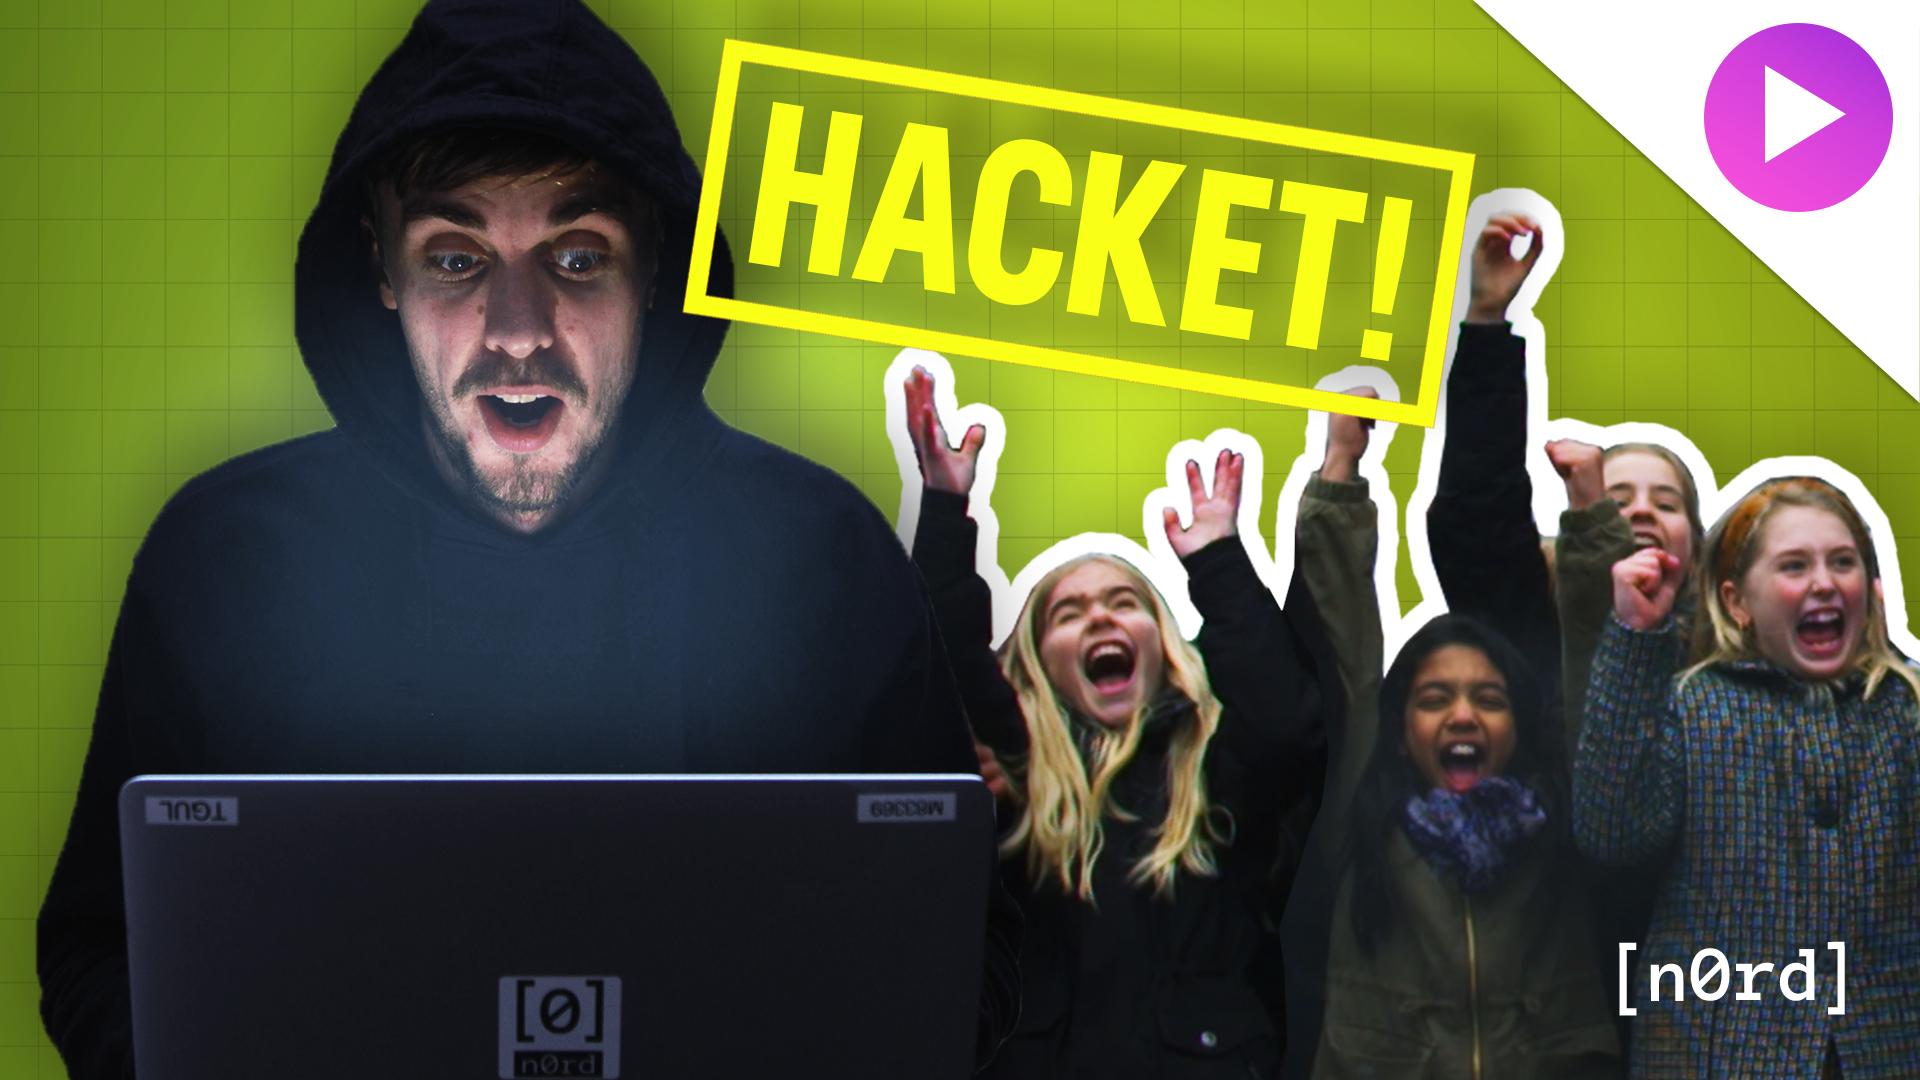 noerdhacking-web.png